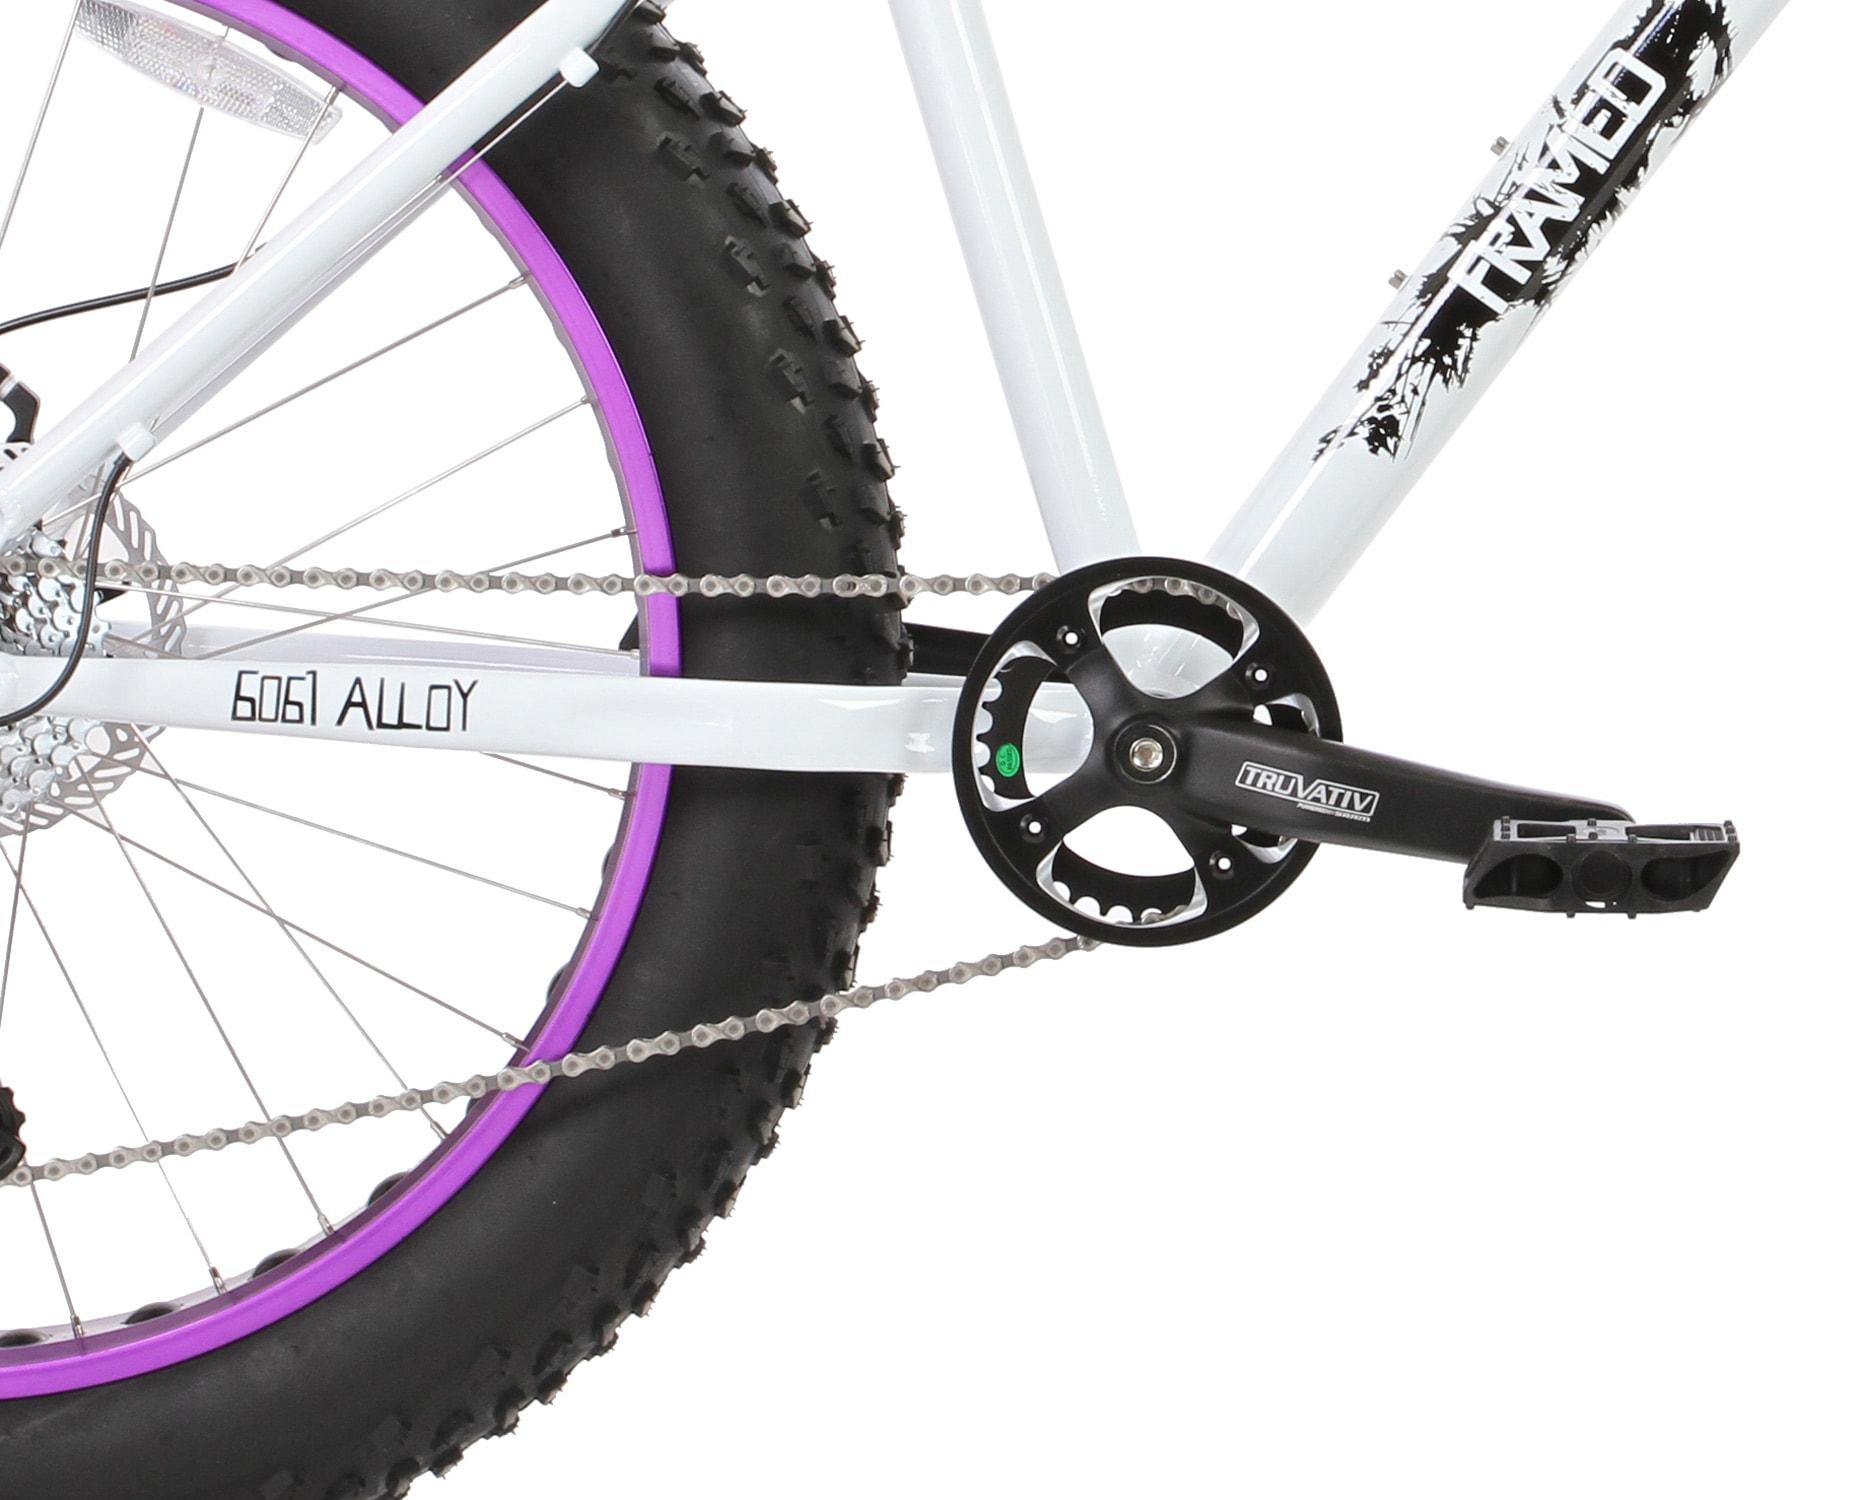 On Sale Framed Minnesota 1.0 Fat Bike - Womens up to 50% off